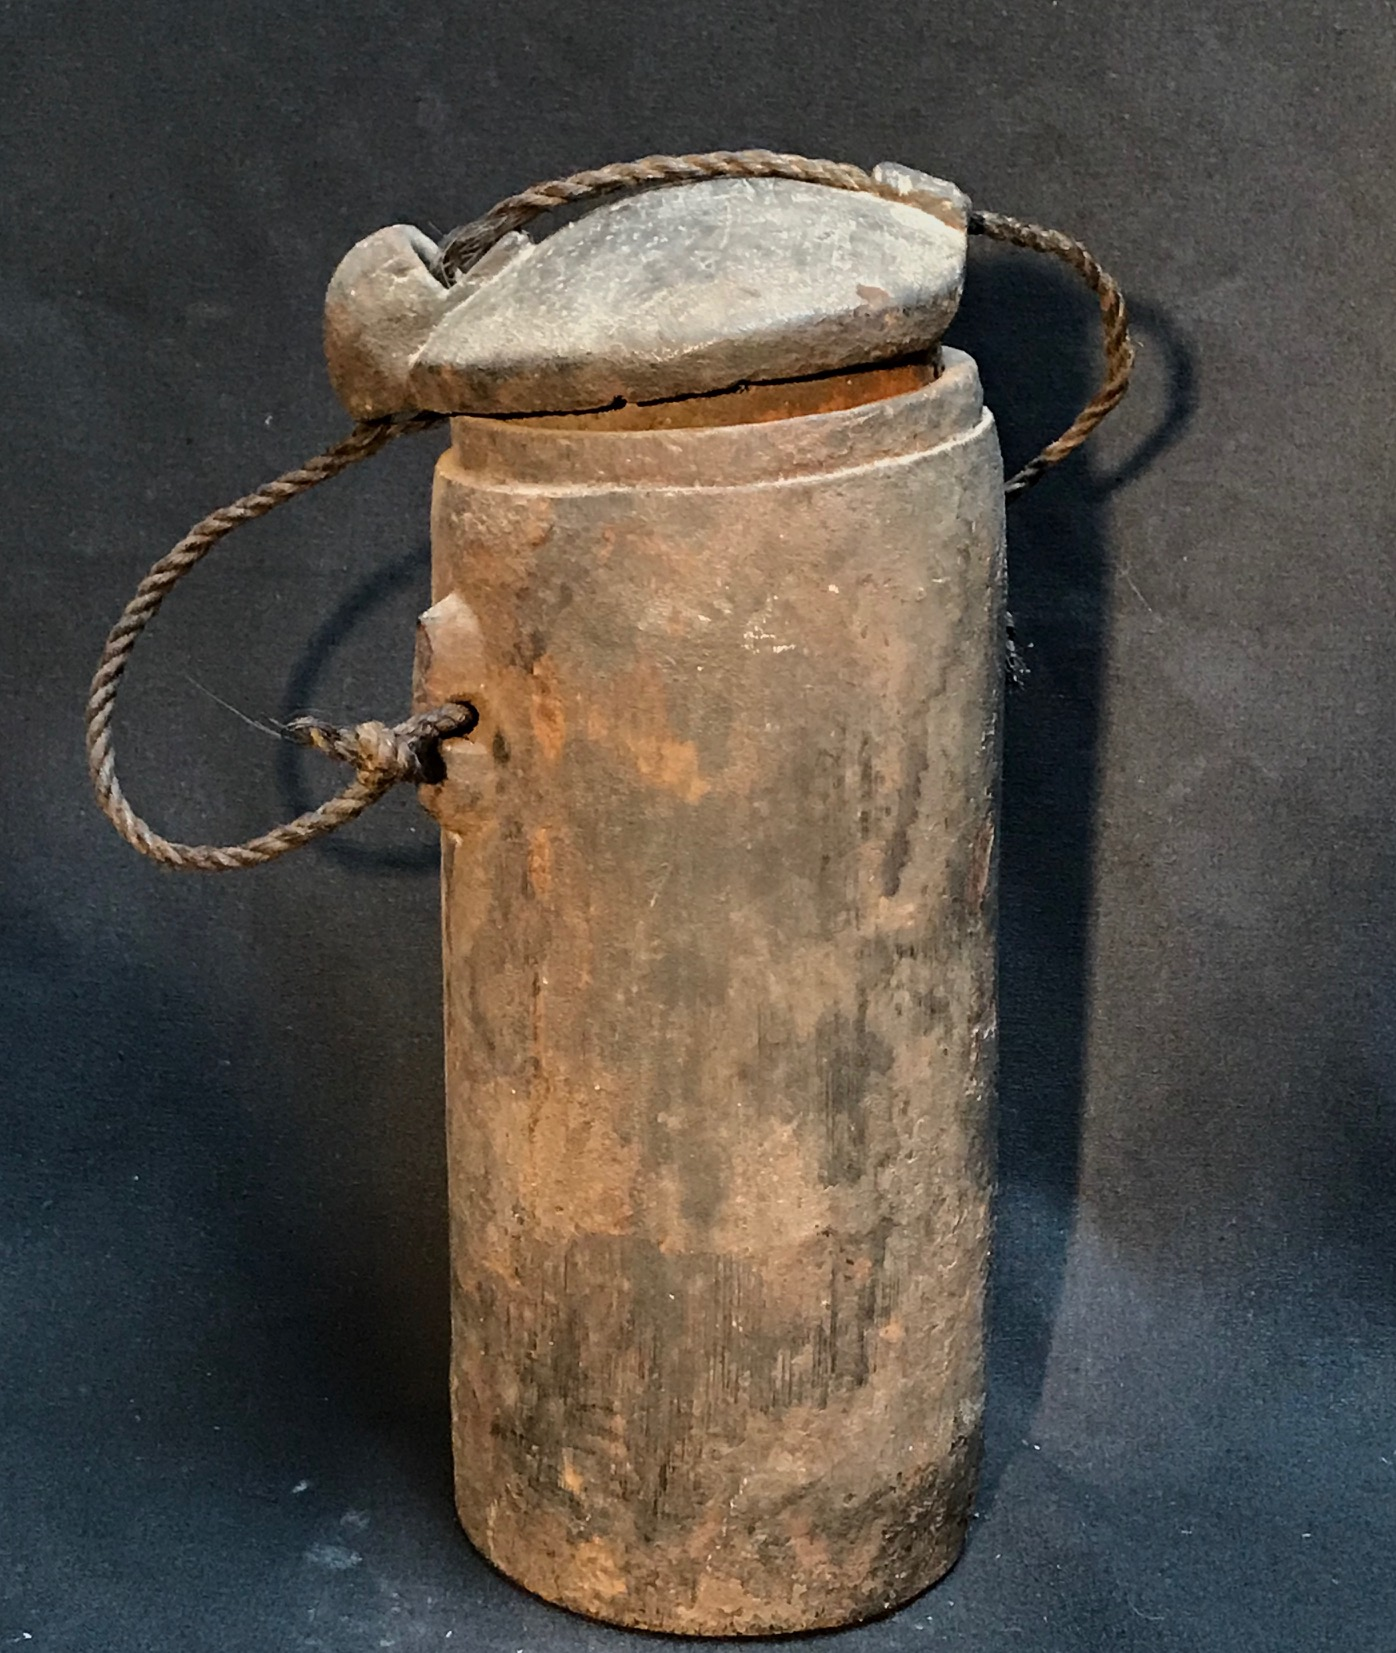 "Shaman's medicine jar, for healing herbs and substances. Sumba Island, Indonesia, early 20th c. bamboo, wood, twine, 12"" x 4 1/2"", $"